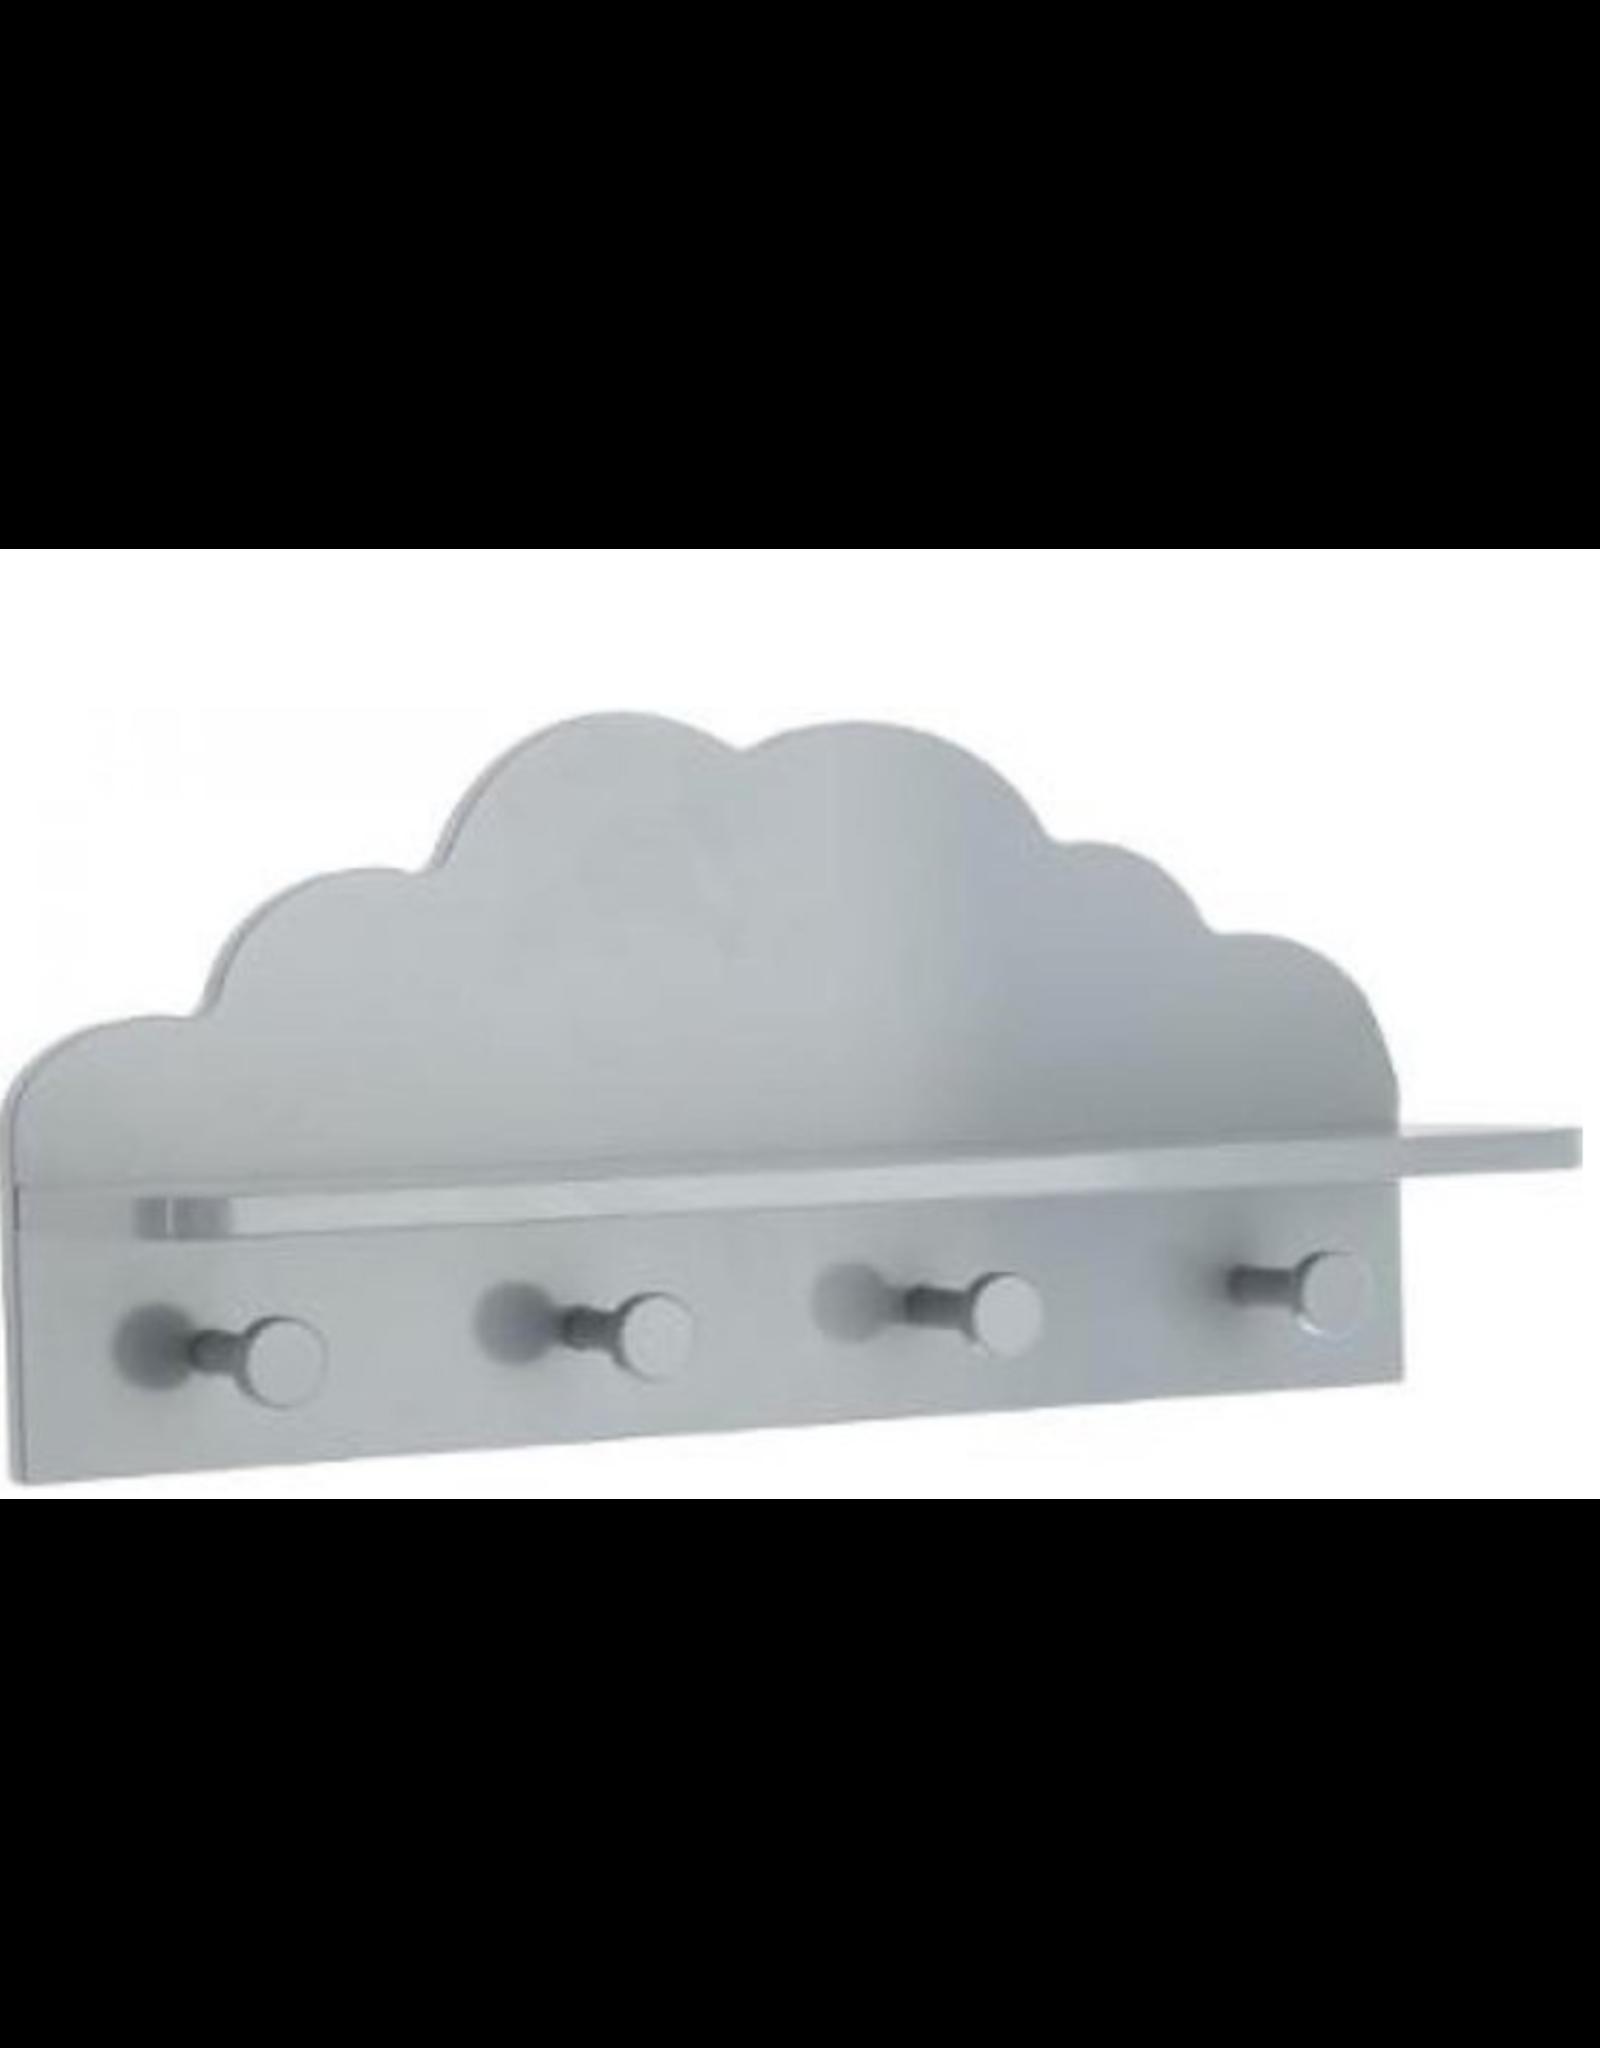 Atmosphera Kapstokje kinderen wolk vorm kleur grijs schattig kinder of babykamer